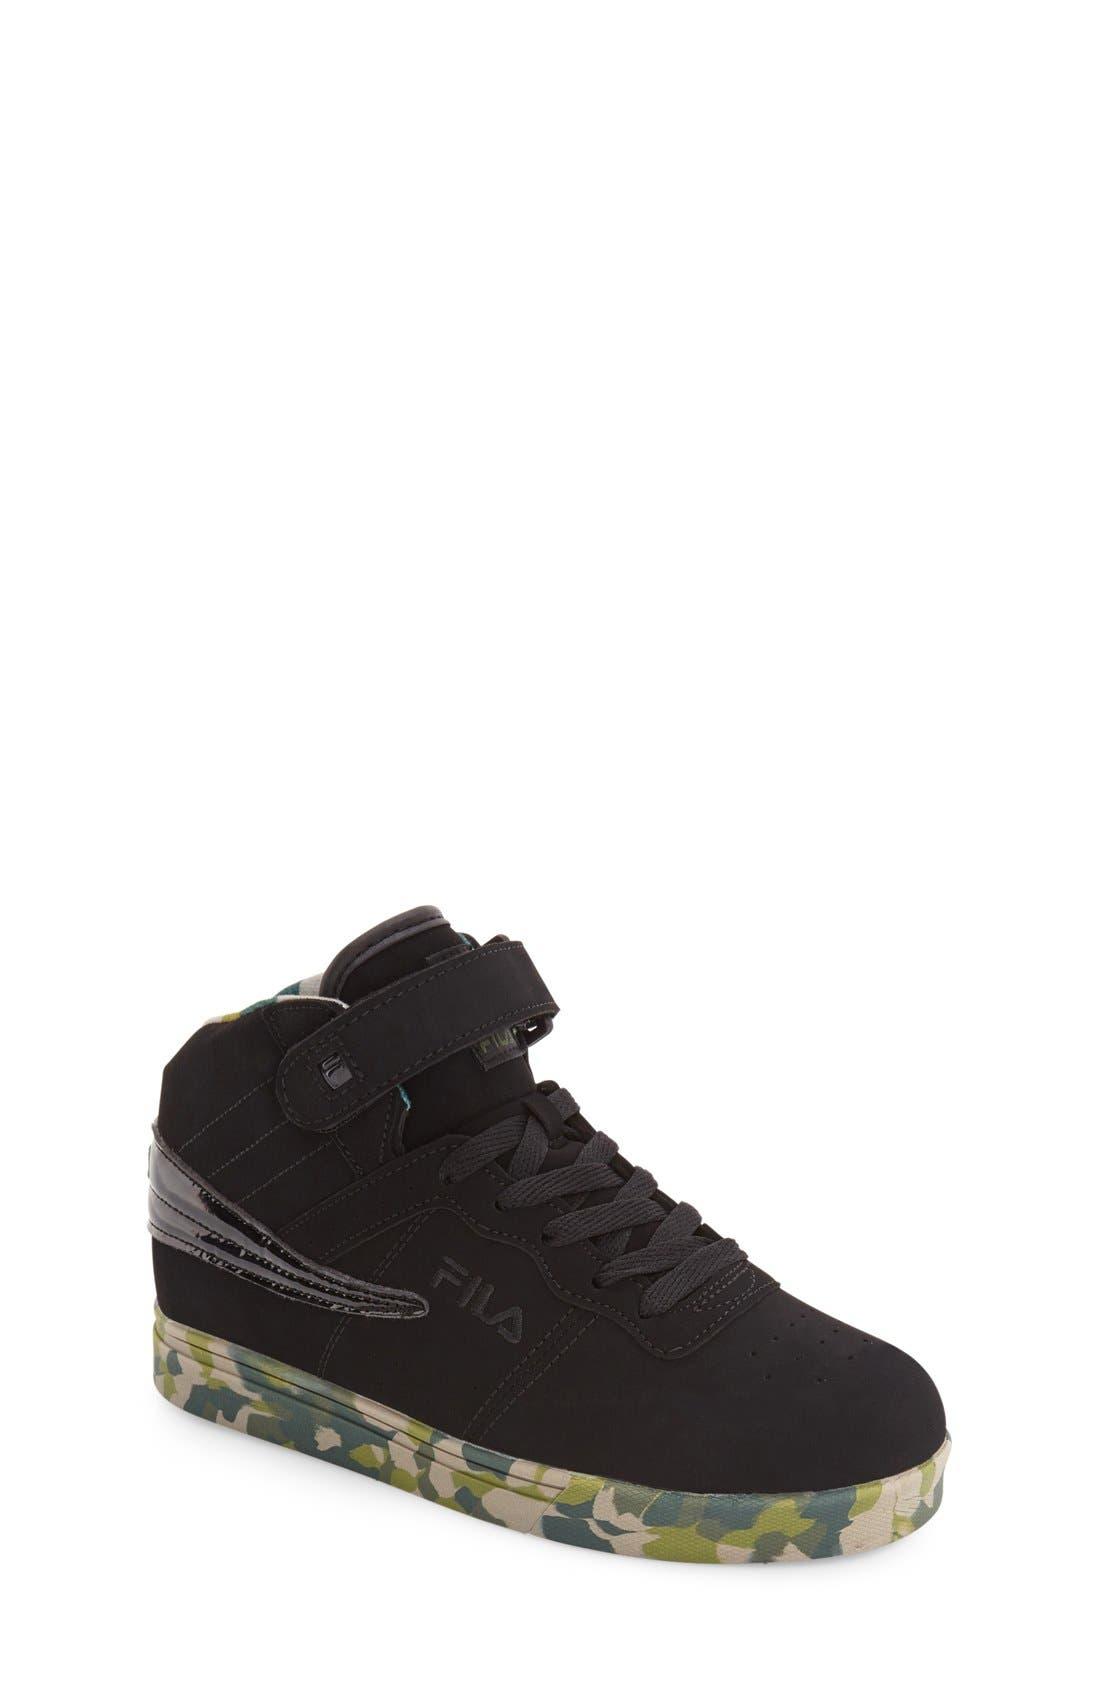 Alternate Image 1 Selected - FILA Vulc 13 Mashup High Top Sneaker (Toddler, Little Kid & Big Kid)